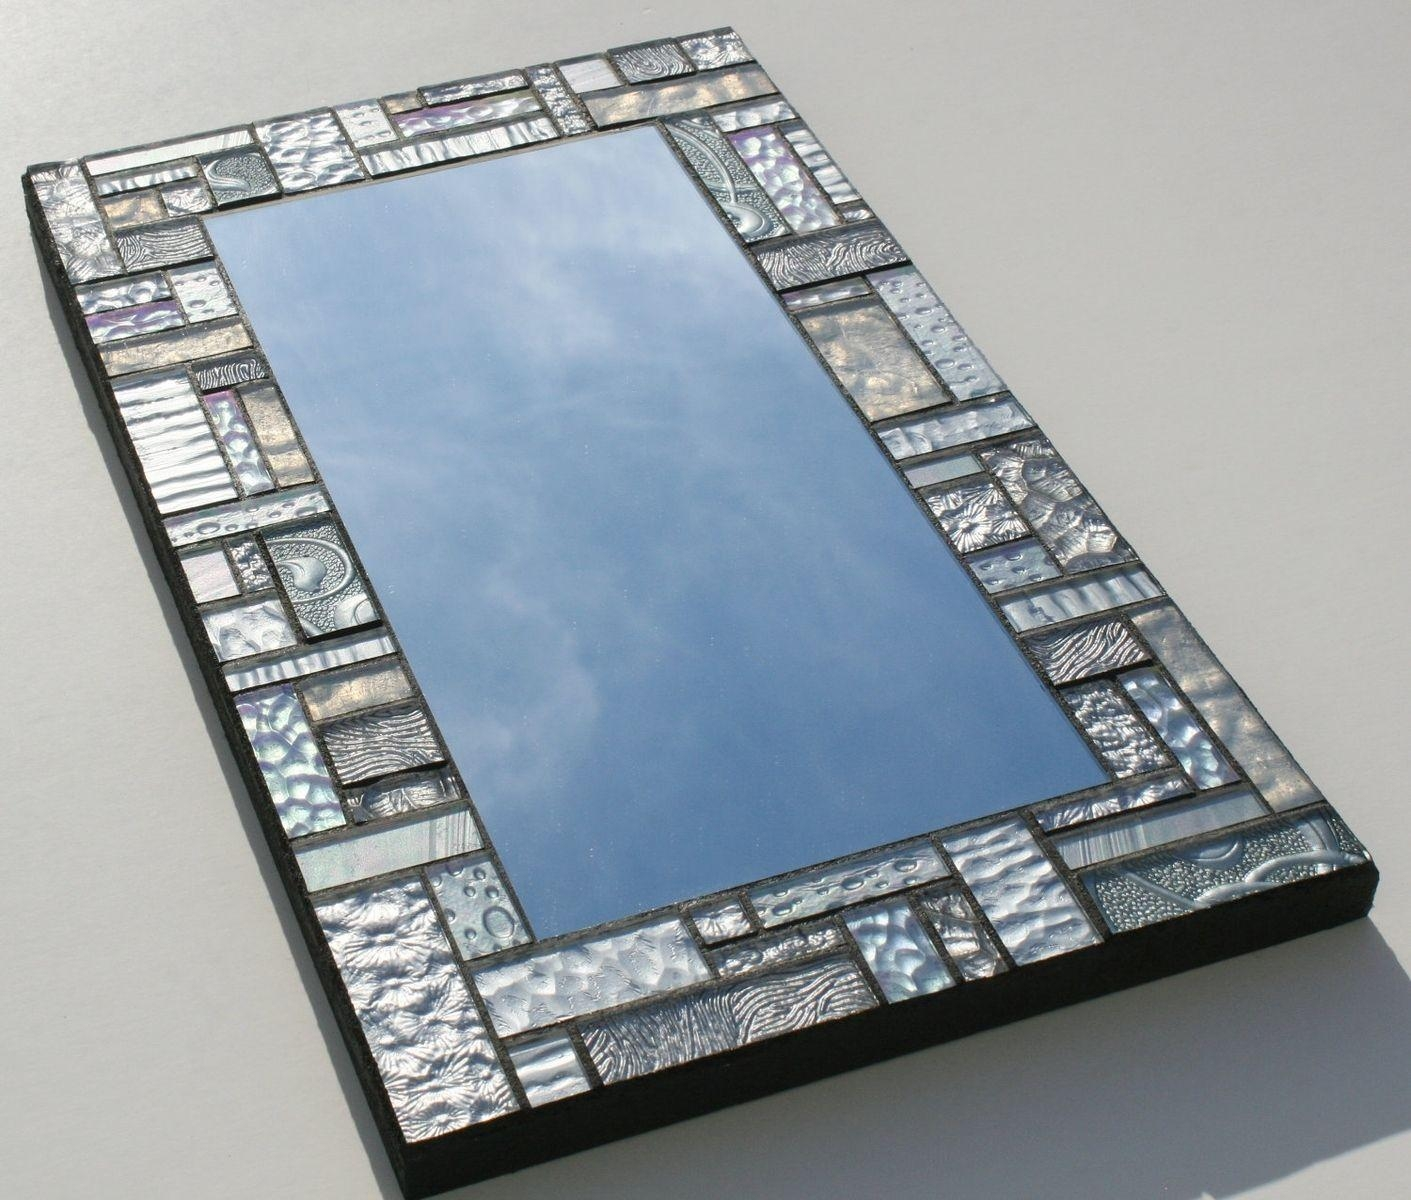 Large Mosaic Wall Mirror : House Photos – Stylish Mosaic Wall Mirror With Large Mosaic Mirror (View 11 of 20)